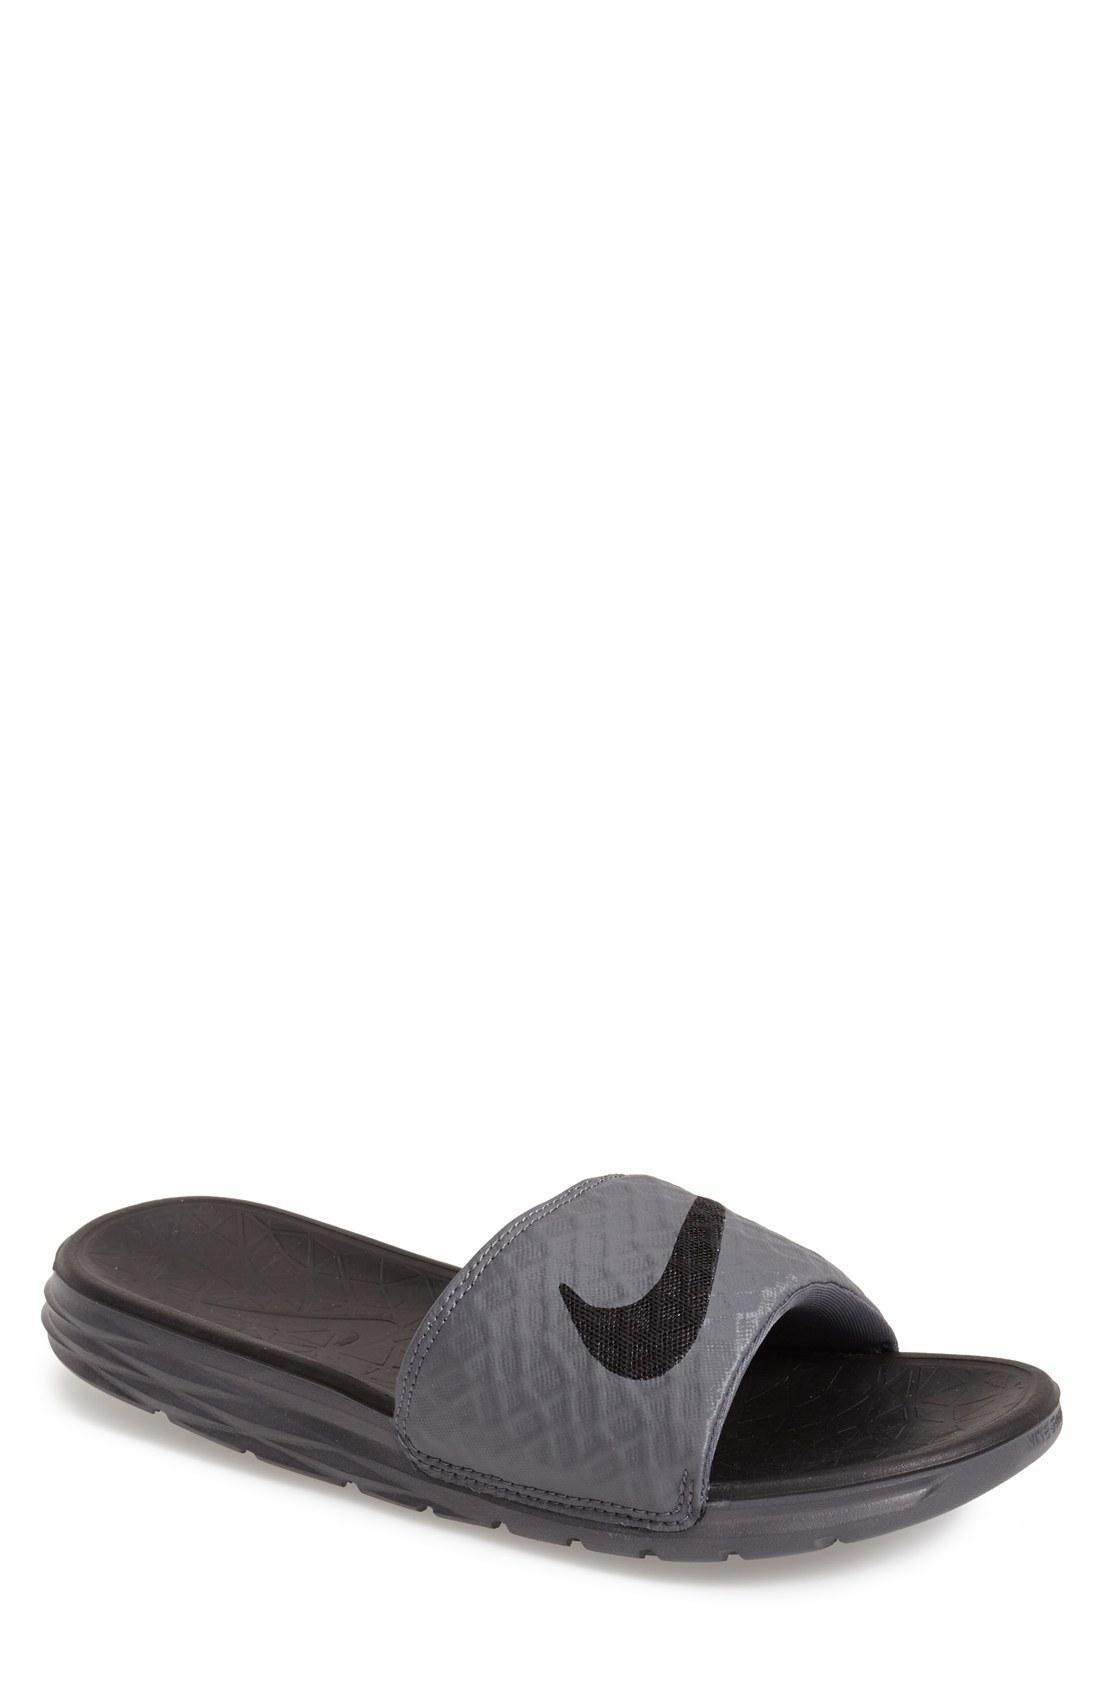 4232055be0a142 Nike Men S Benassi Solarsoft Slide 2 Slide Sandals